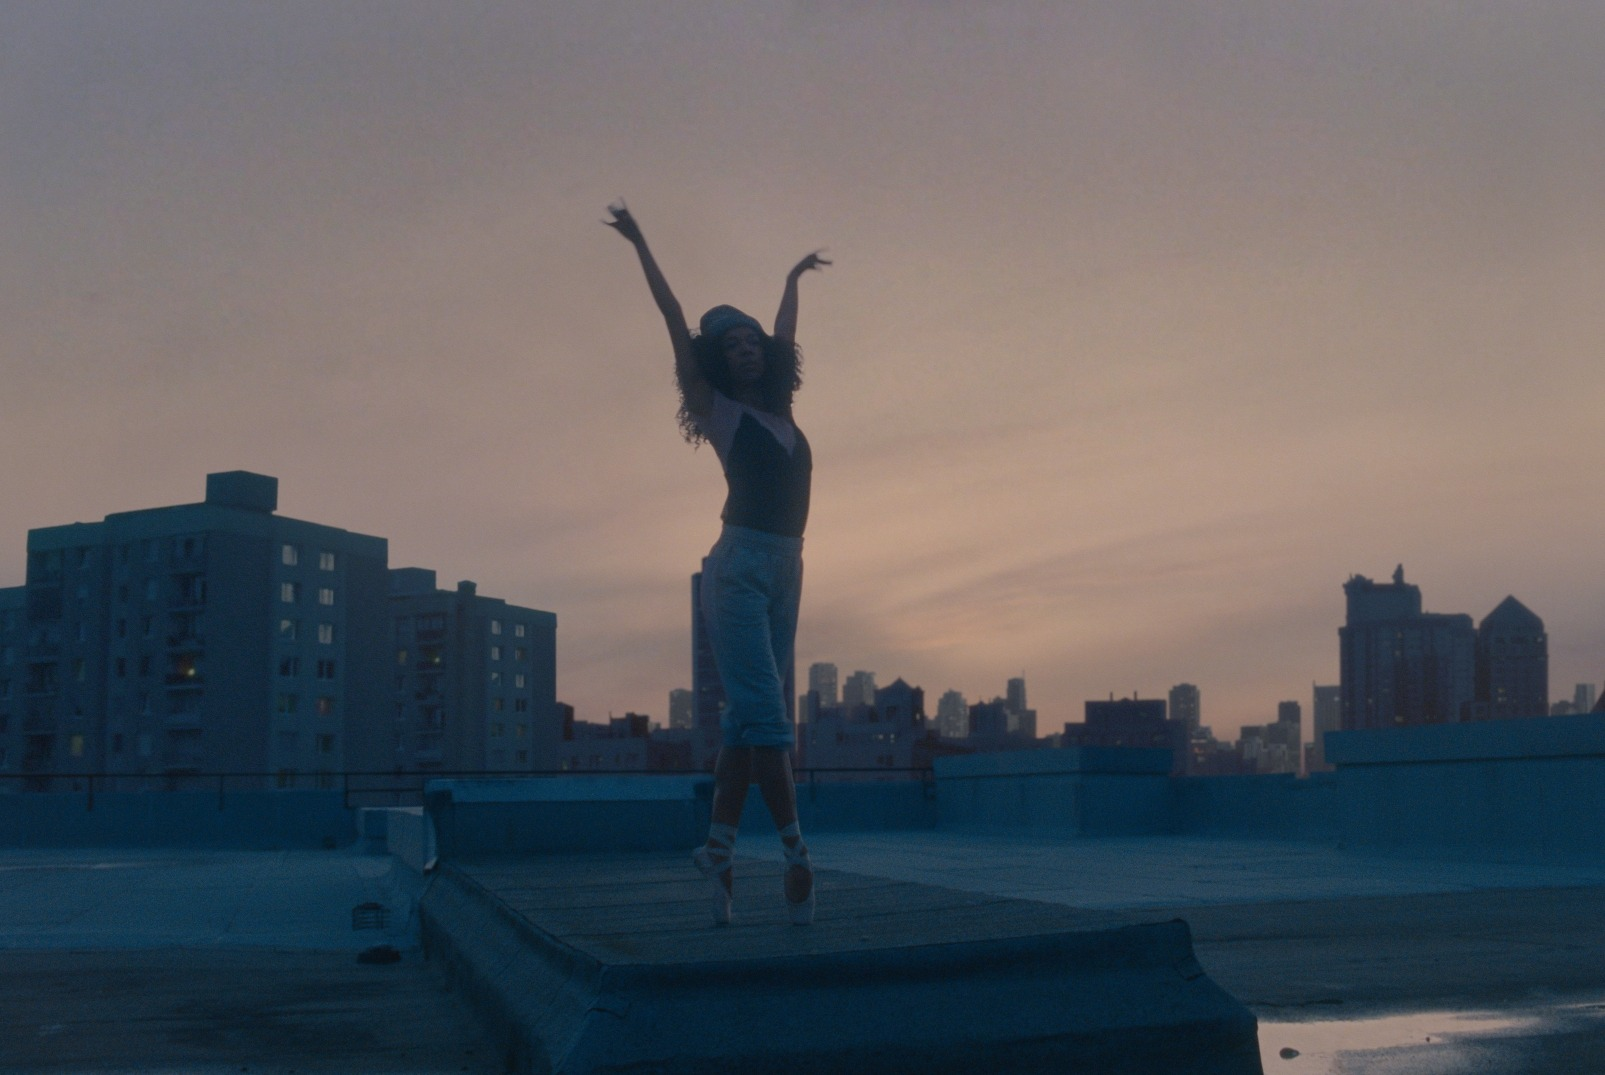 As the ballet school closes due to coronavirus, the dancer carries on training around her neighbourhood